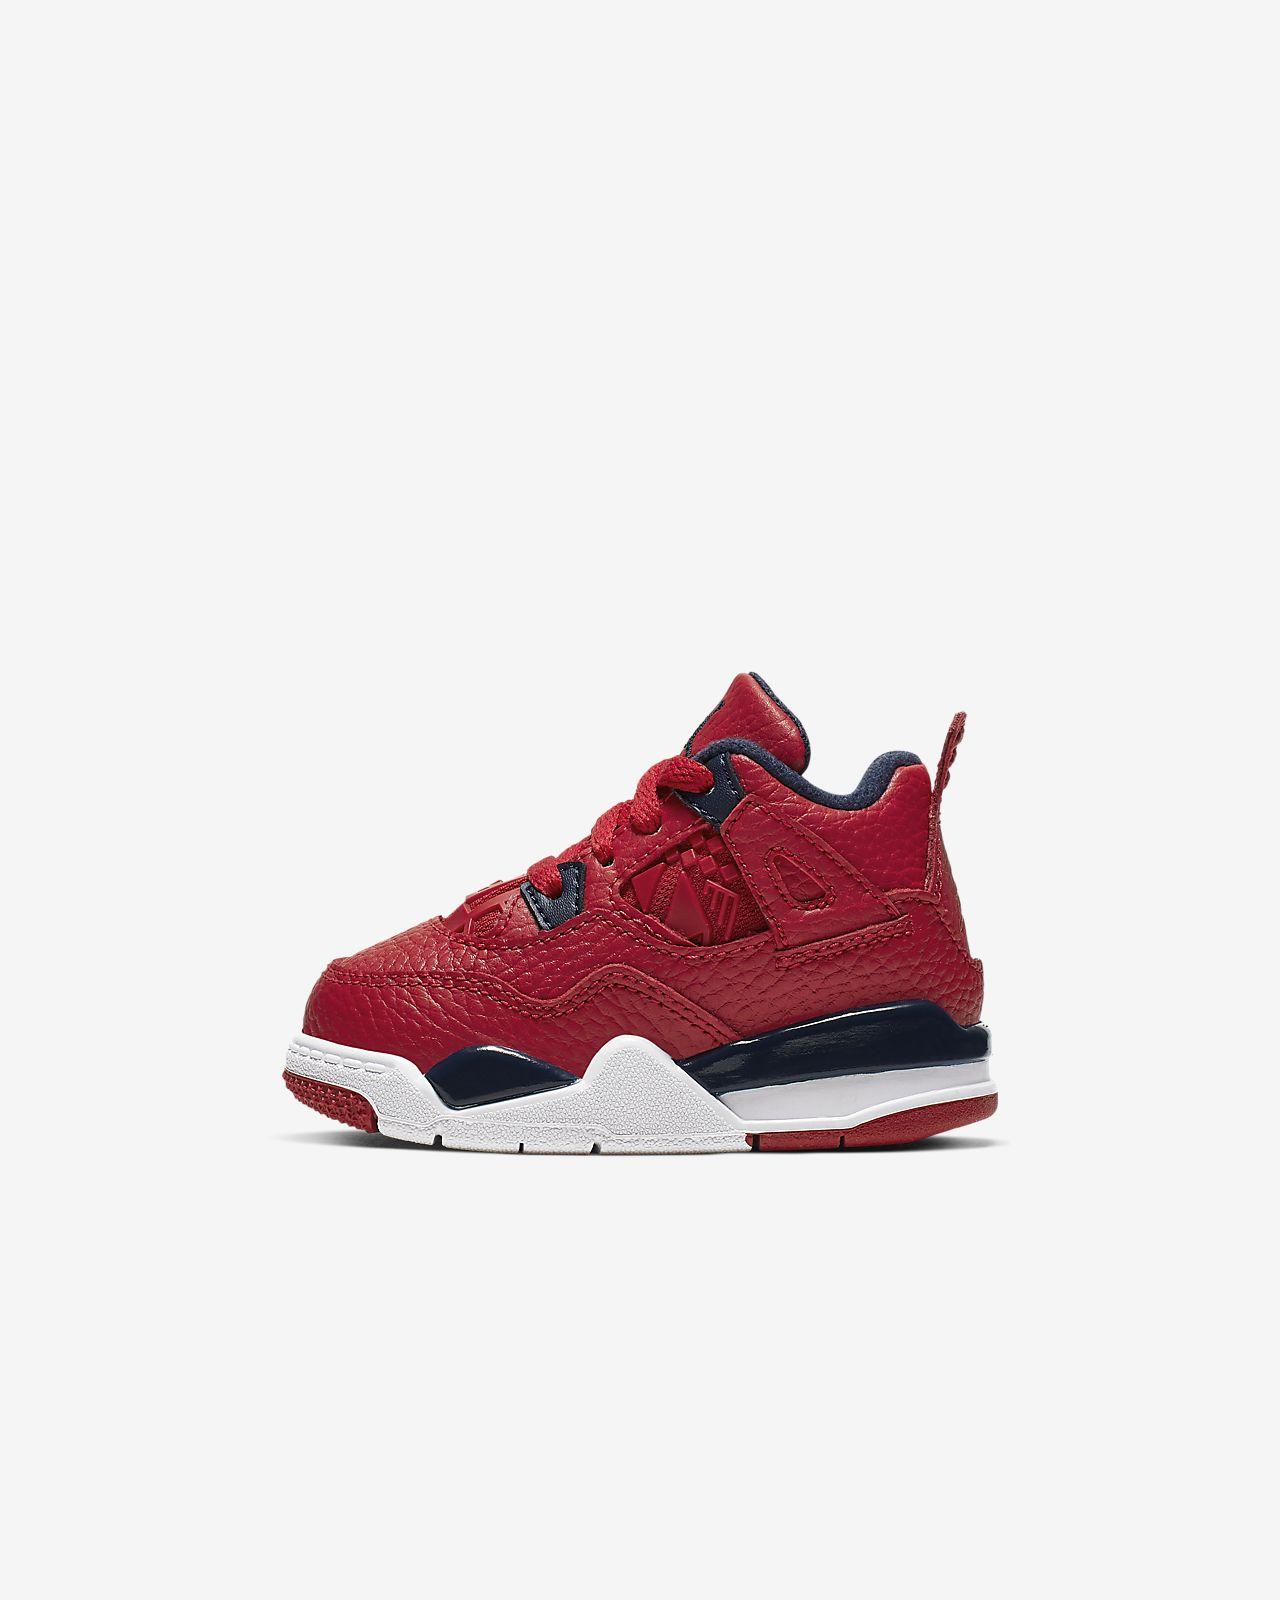 Air Jordan 4 Retro Baby/Toddler Shoe